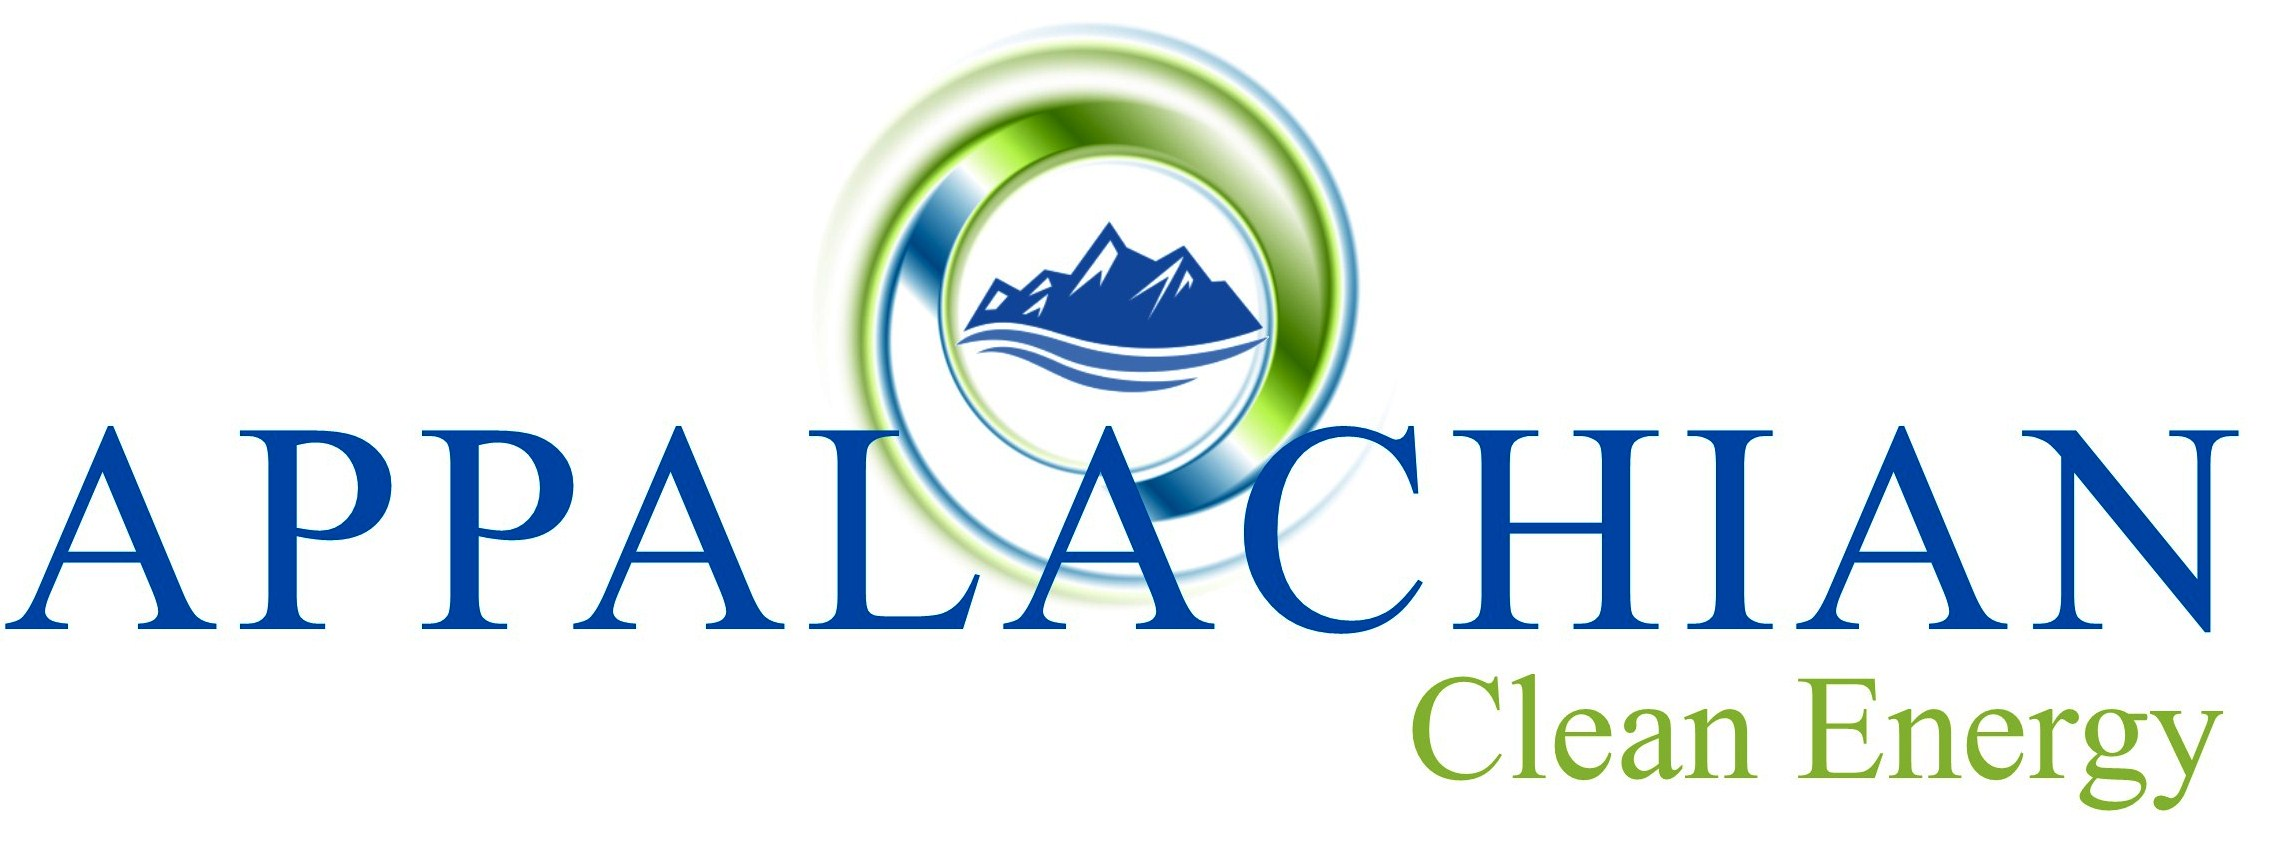 Appalachian Clean Energy